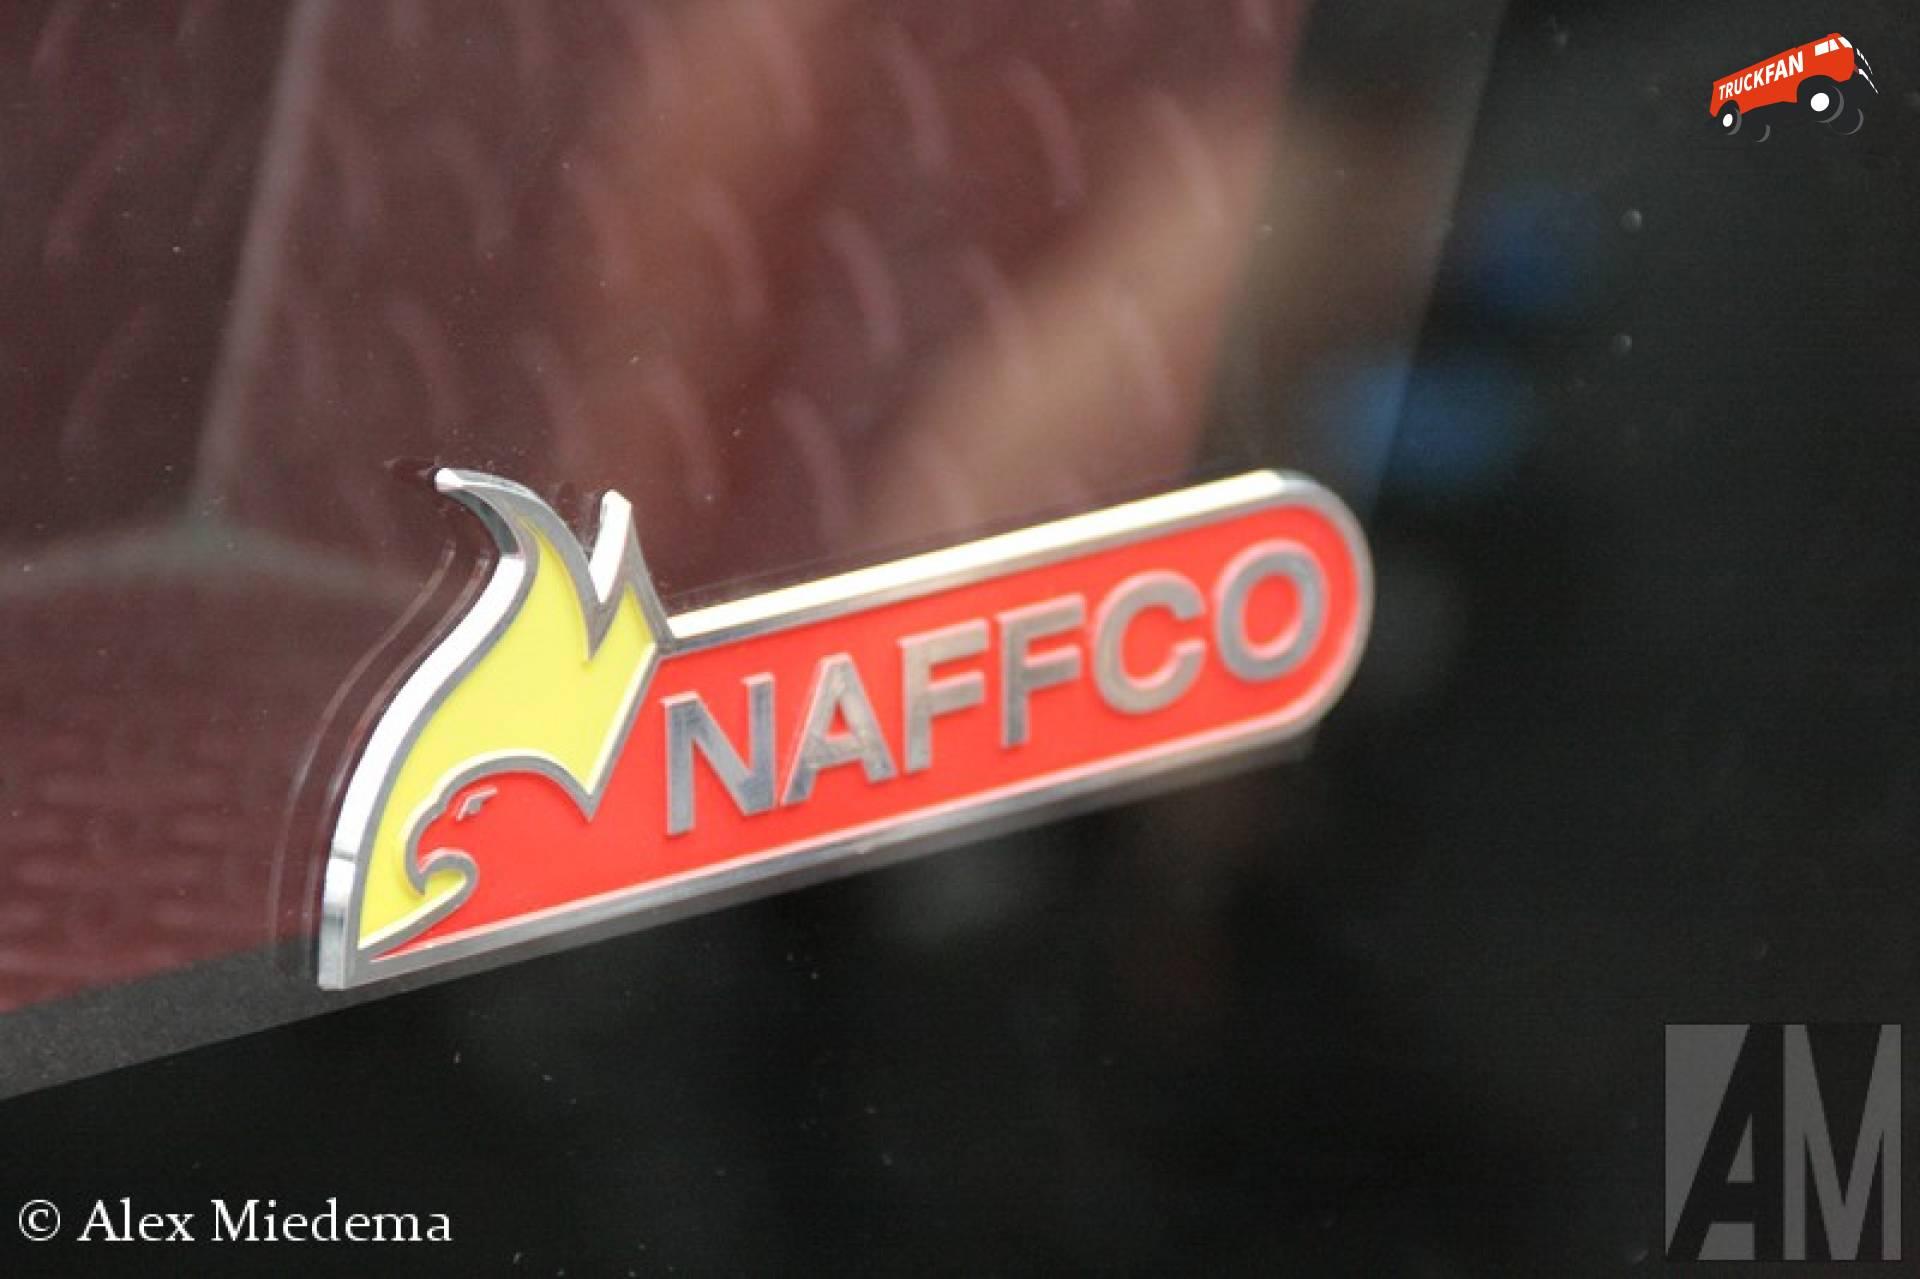 Foto Naffco logo #1075323 - TruckFan